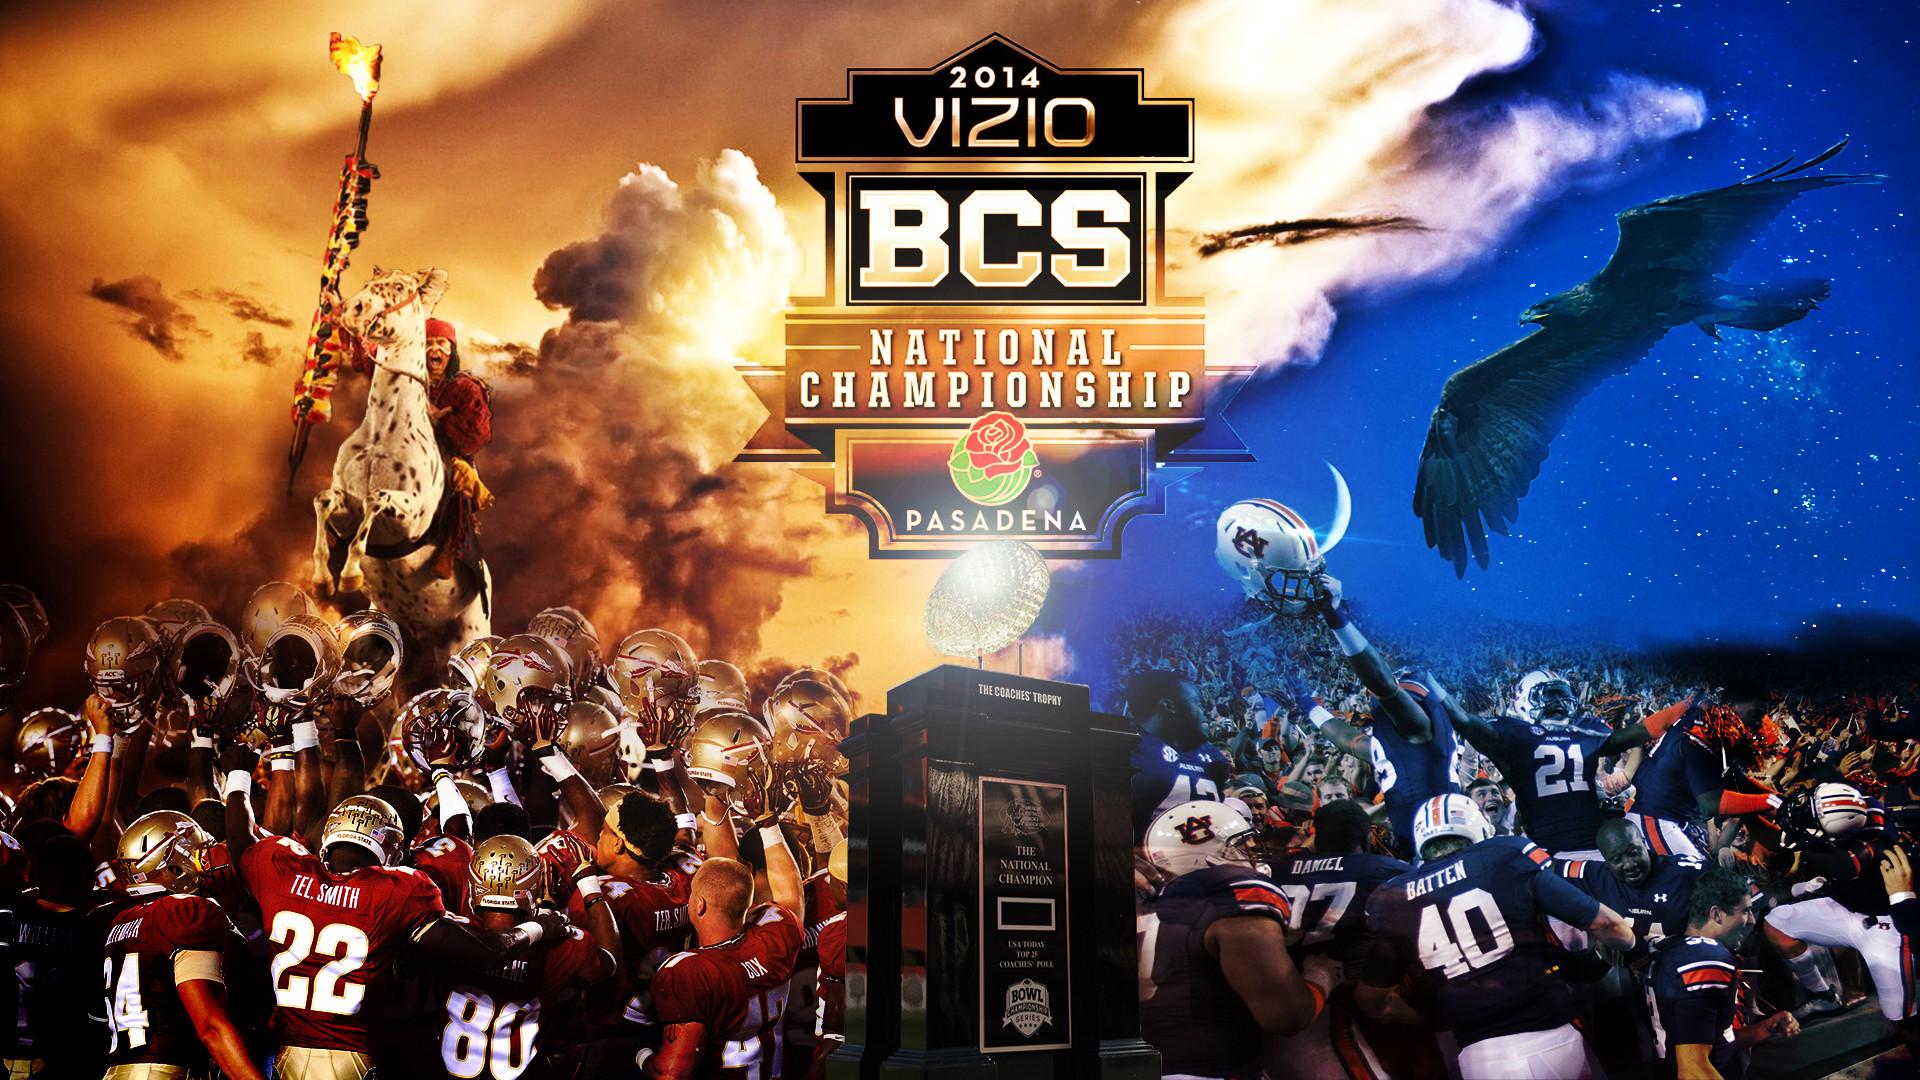 Wallpaper for the 2014 BCS National Championship Game #1 Florida State  Seminoles vs. #